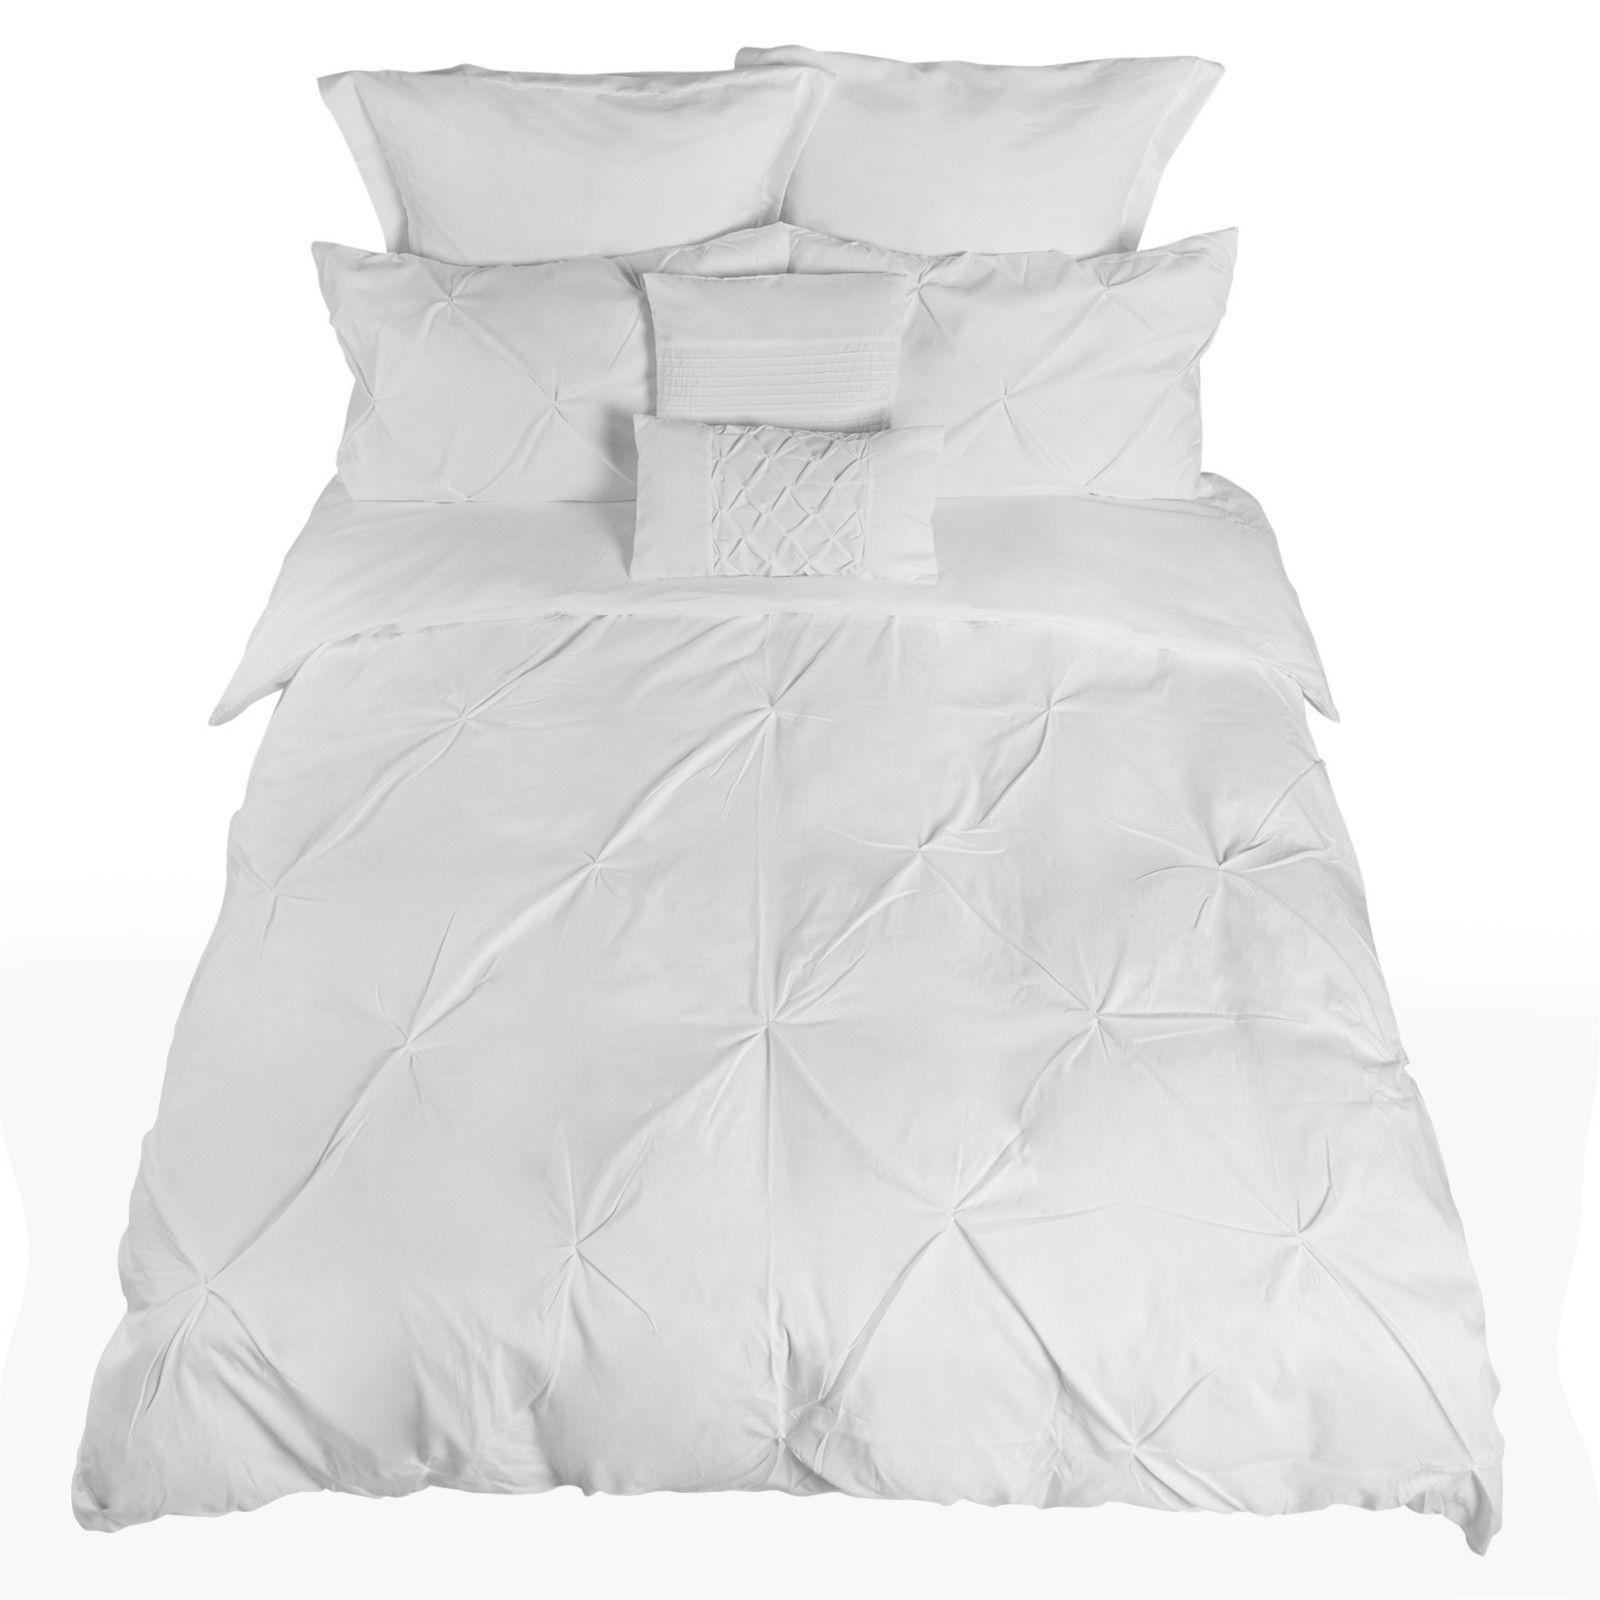 Royal-Comfort-7-Pc-Soft-Microfiber-Fitted-Pleat-Comforter-Case-Blanket-Bed-Set